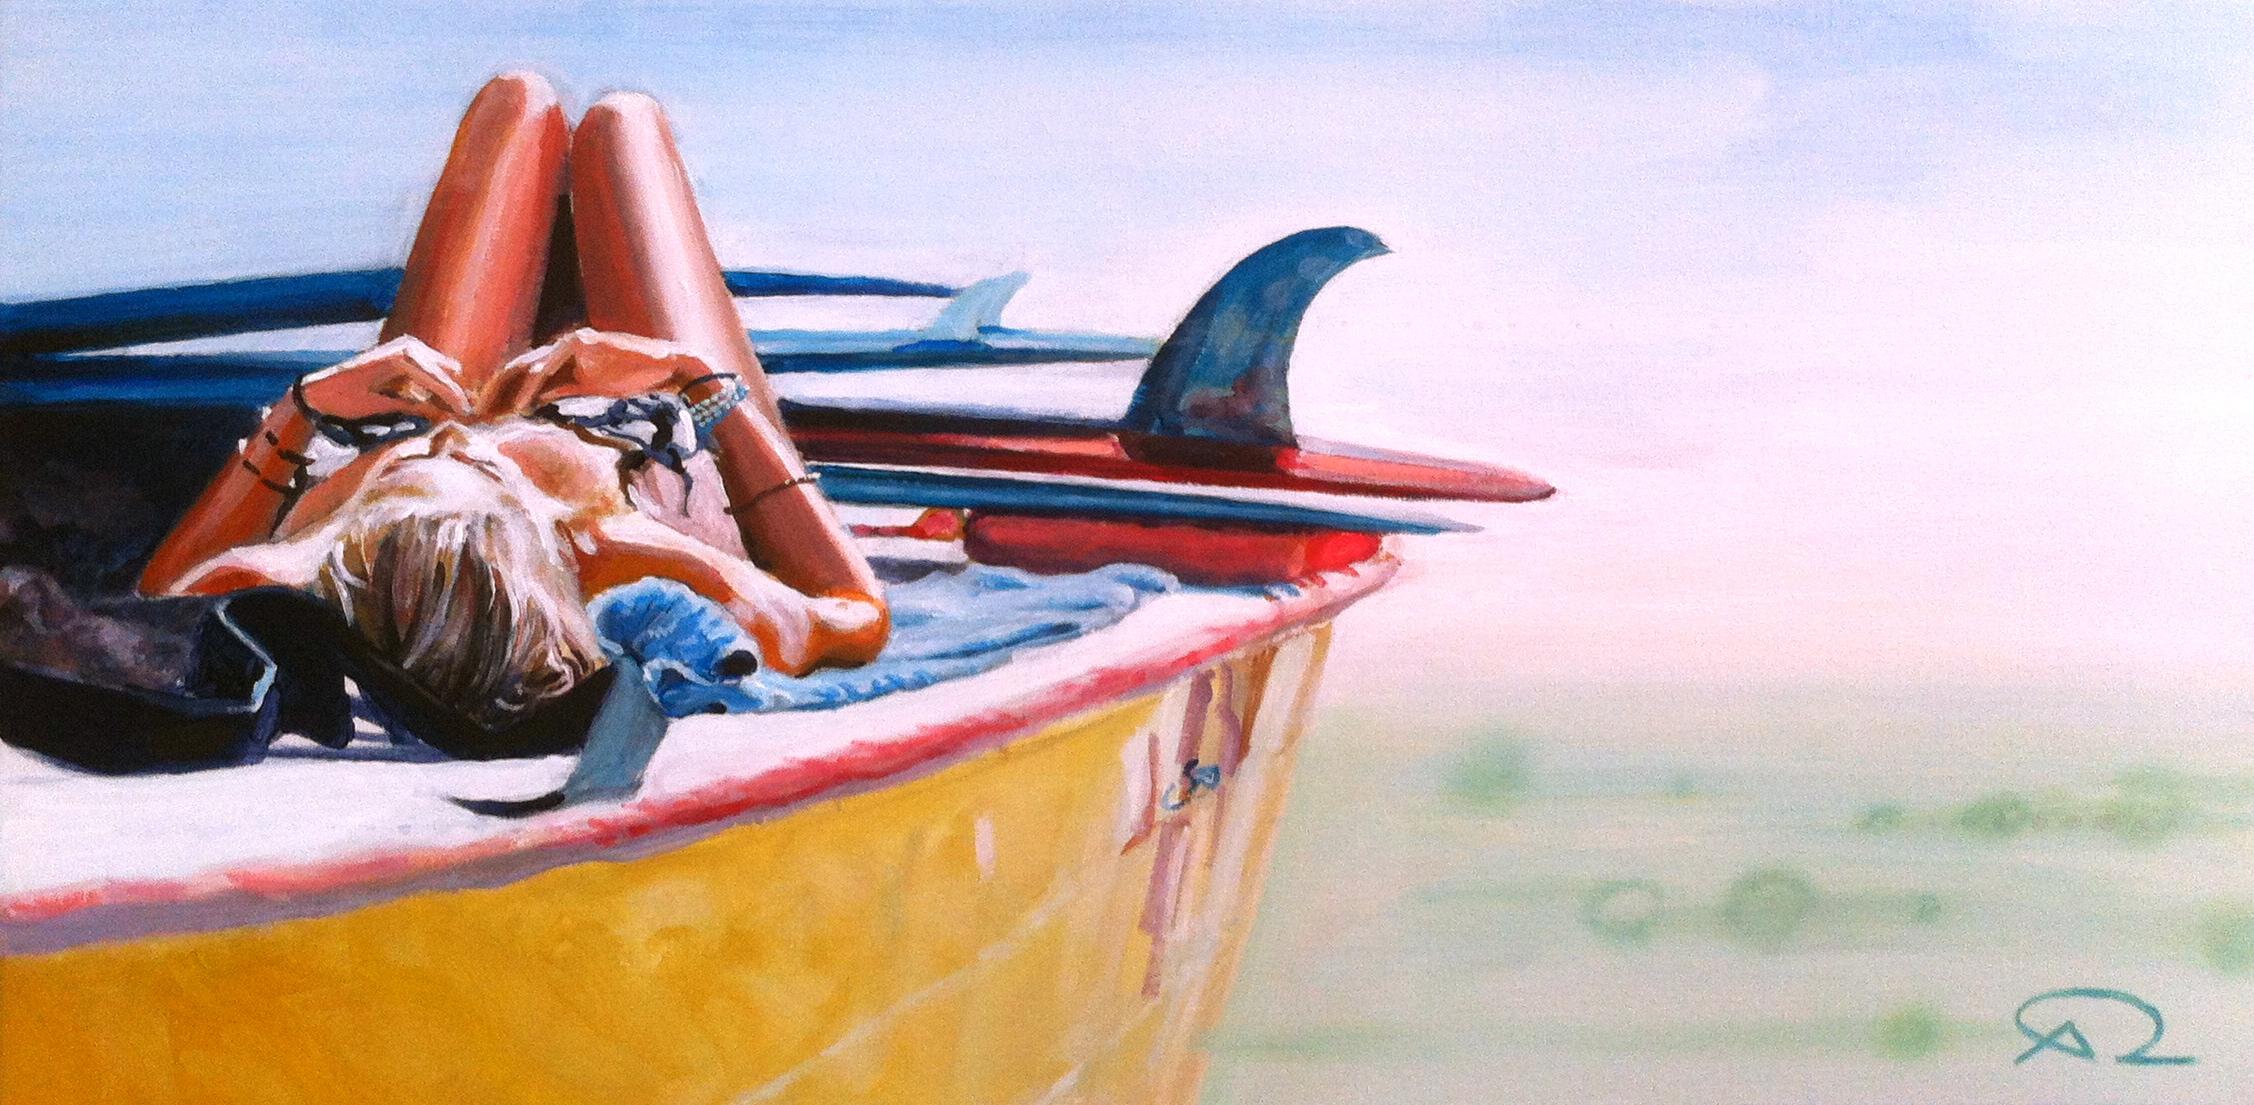 """Felicità"" - Antoine Renault  2012 - Acrylic on canvas - 80x40cm"